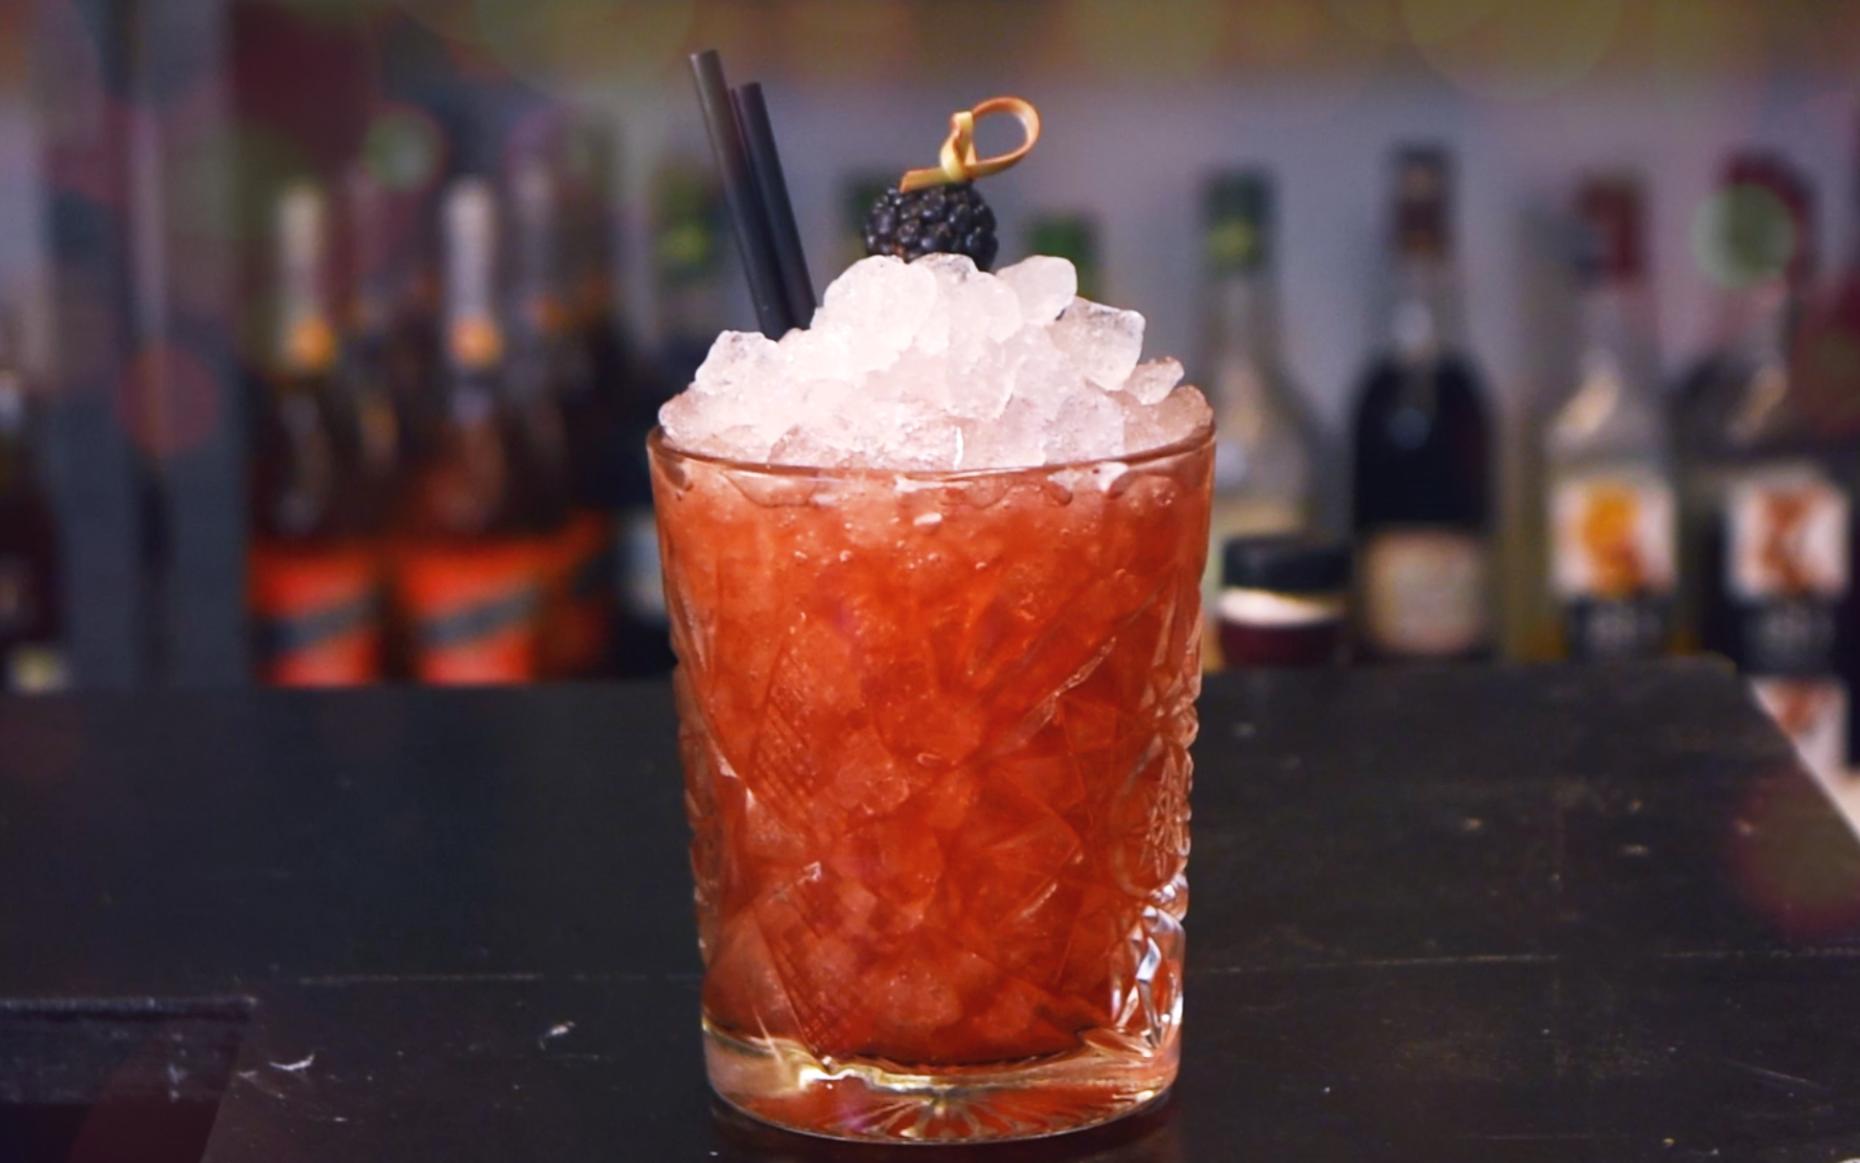 Bramble cocktail recipe - How to make a Bramble recipe - How to make a bramble drink - The best gin cocktail